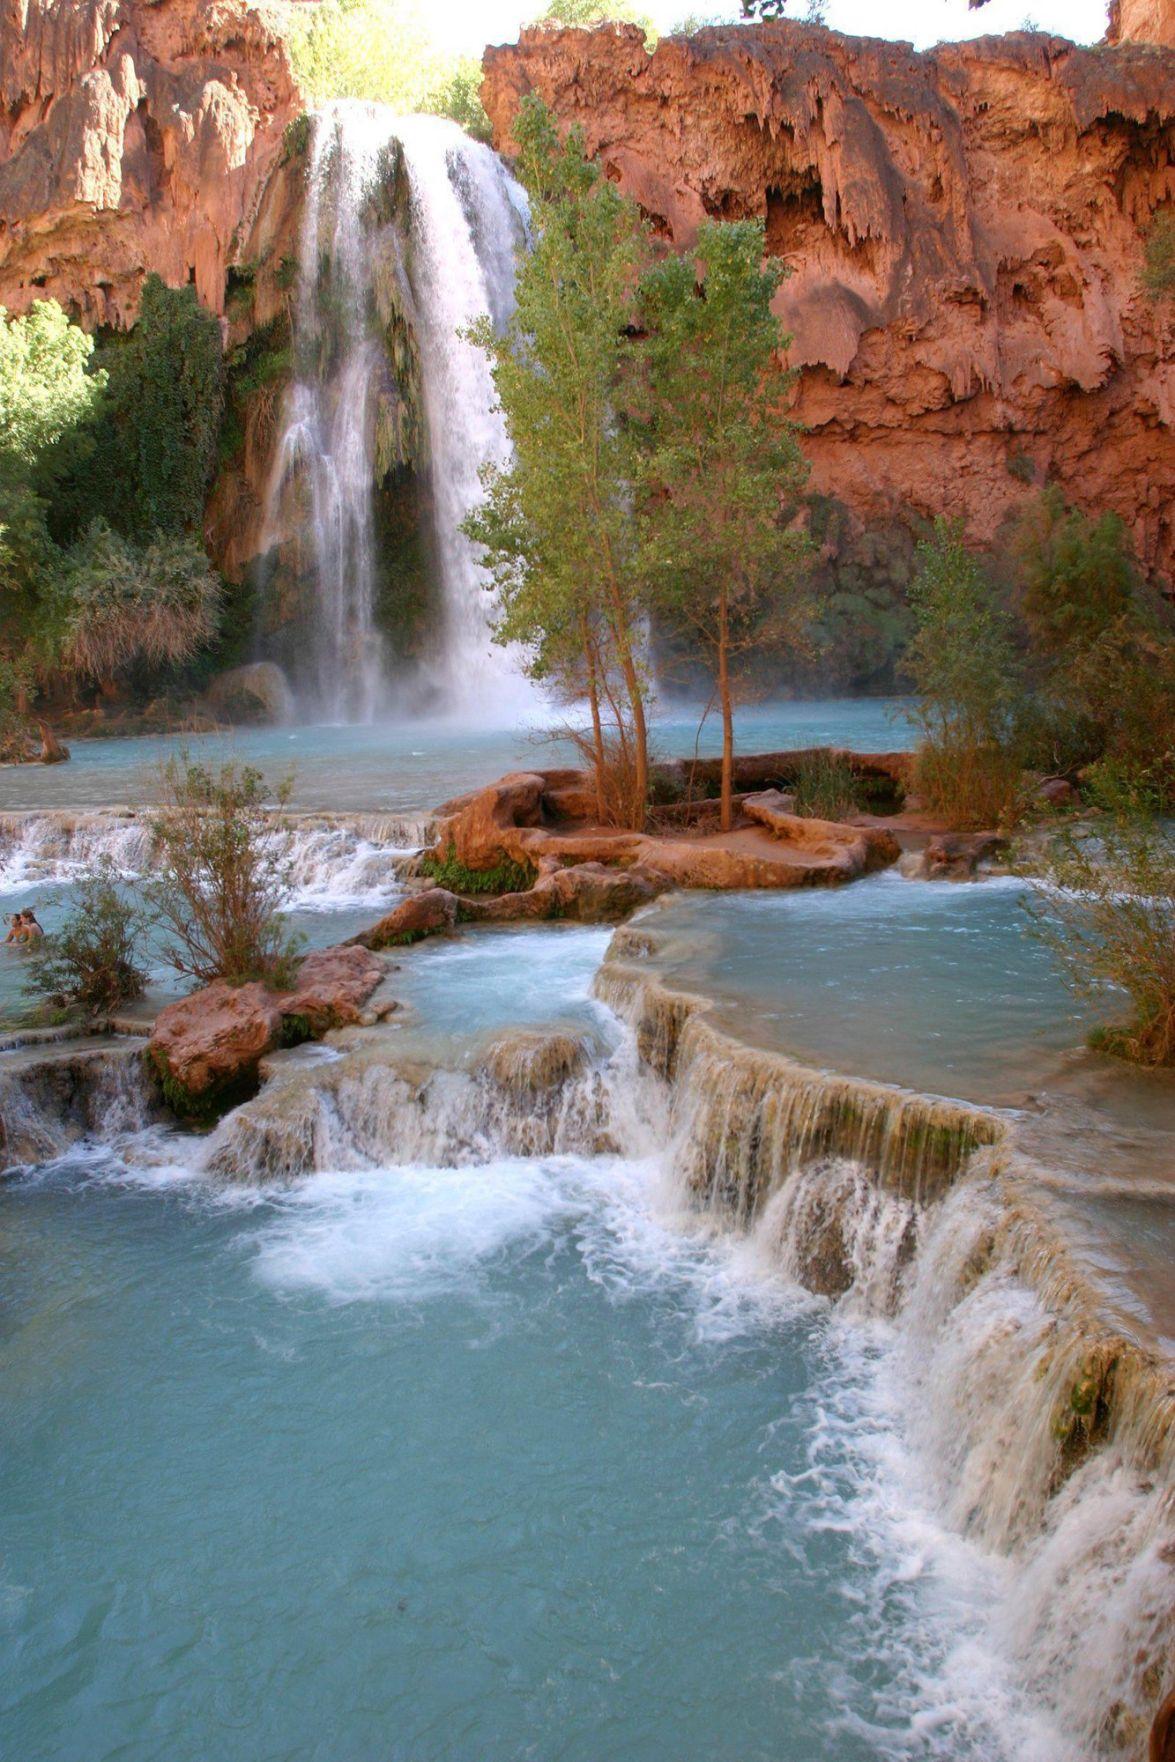 havasu falls: grand canyon trip features waterfalls, an indian